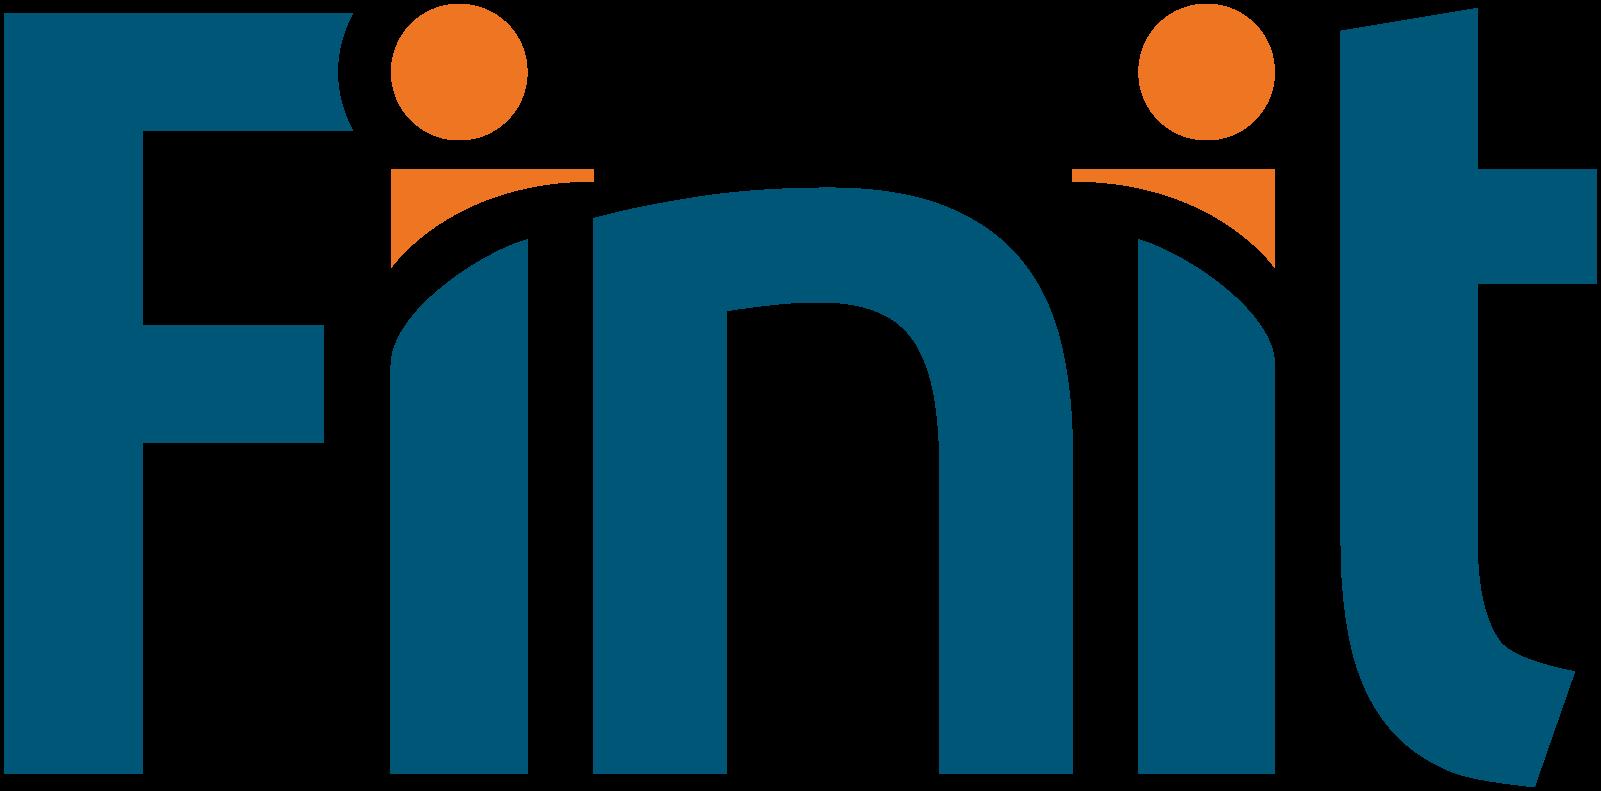 Finit_AST_Blue__Orange_Logo_No_Tagline_No_BG_8Apr19-1